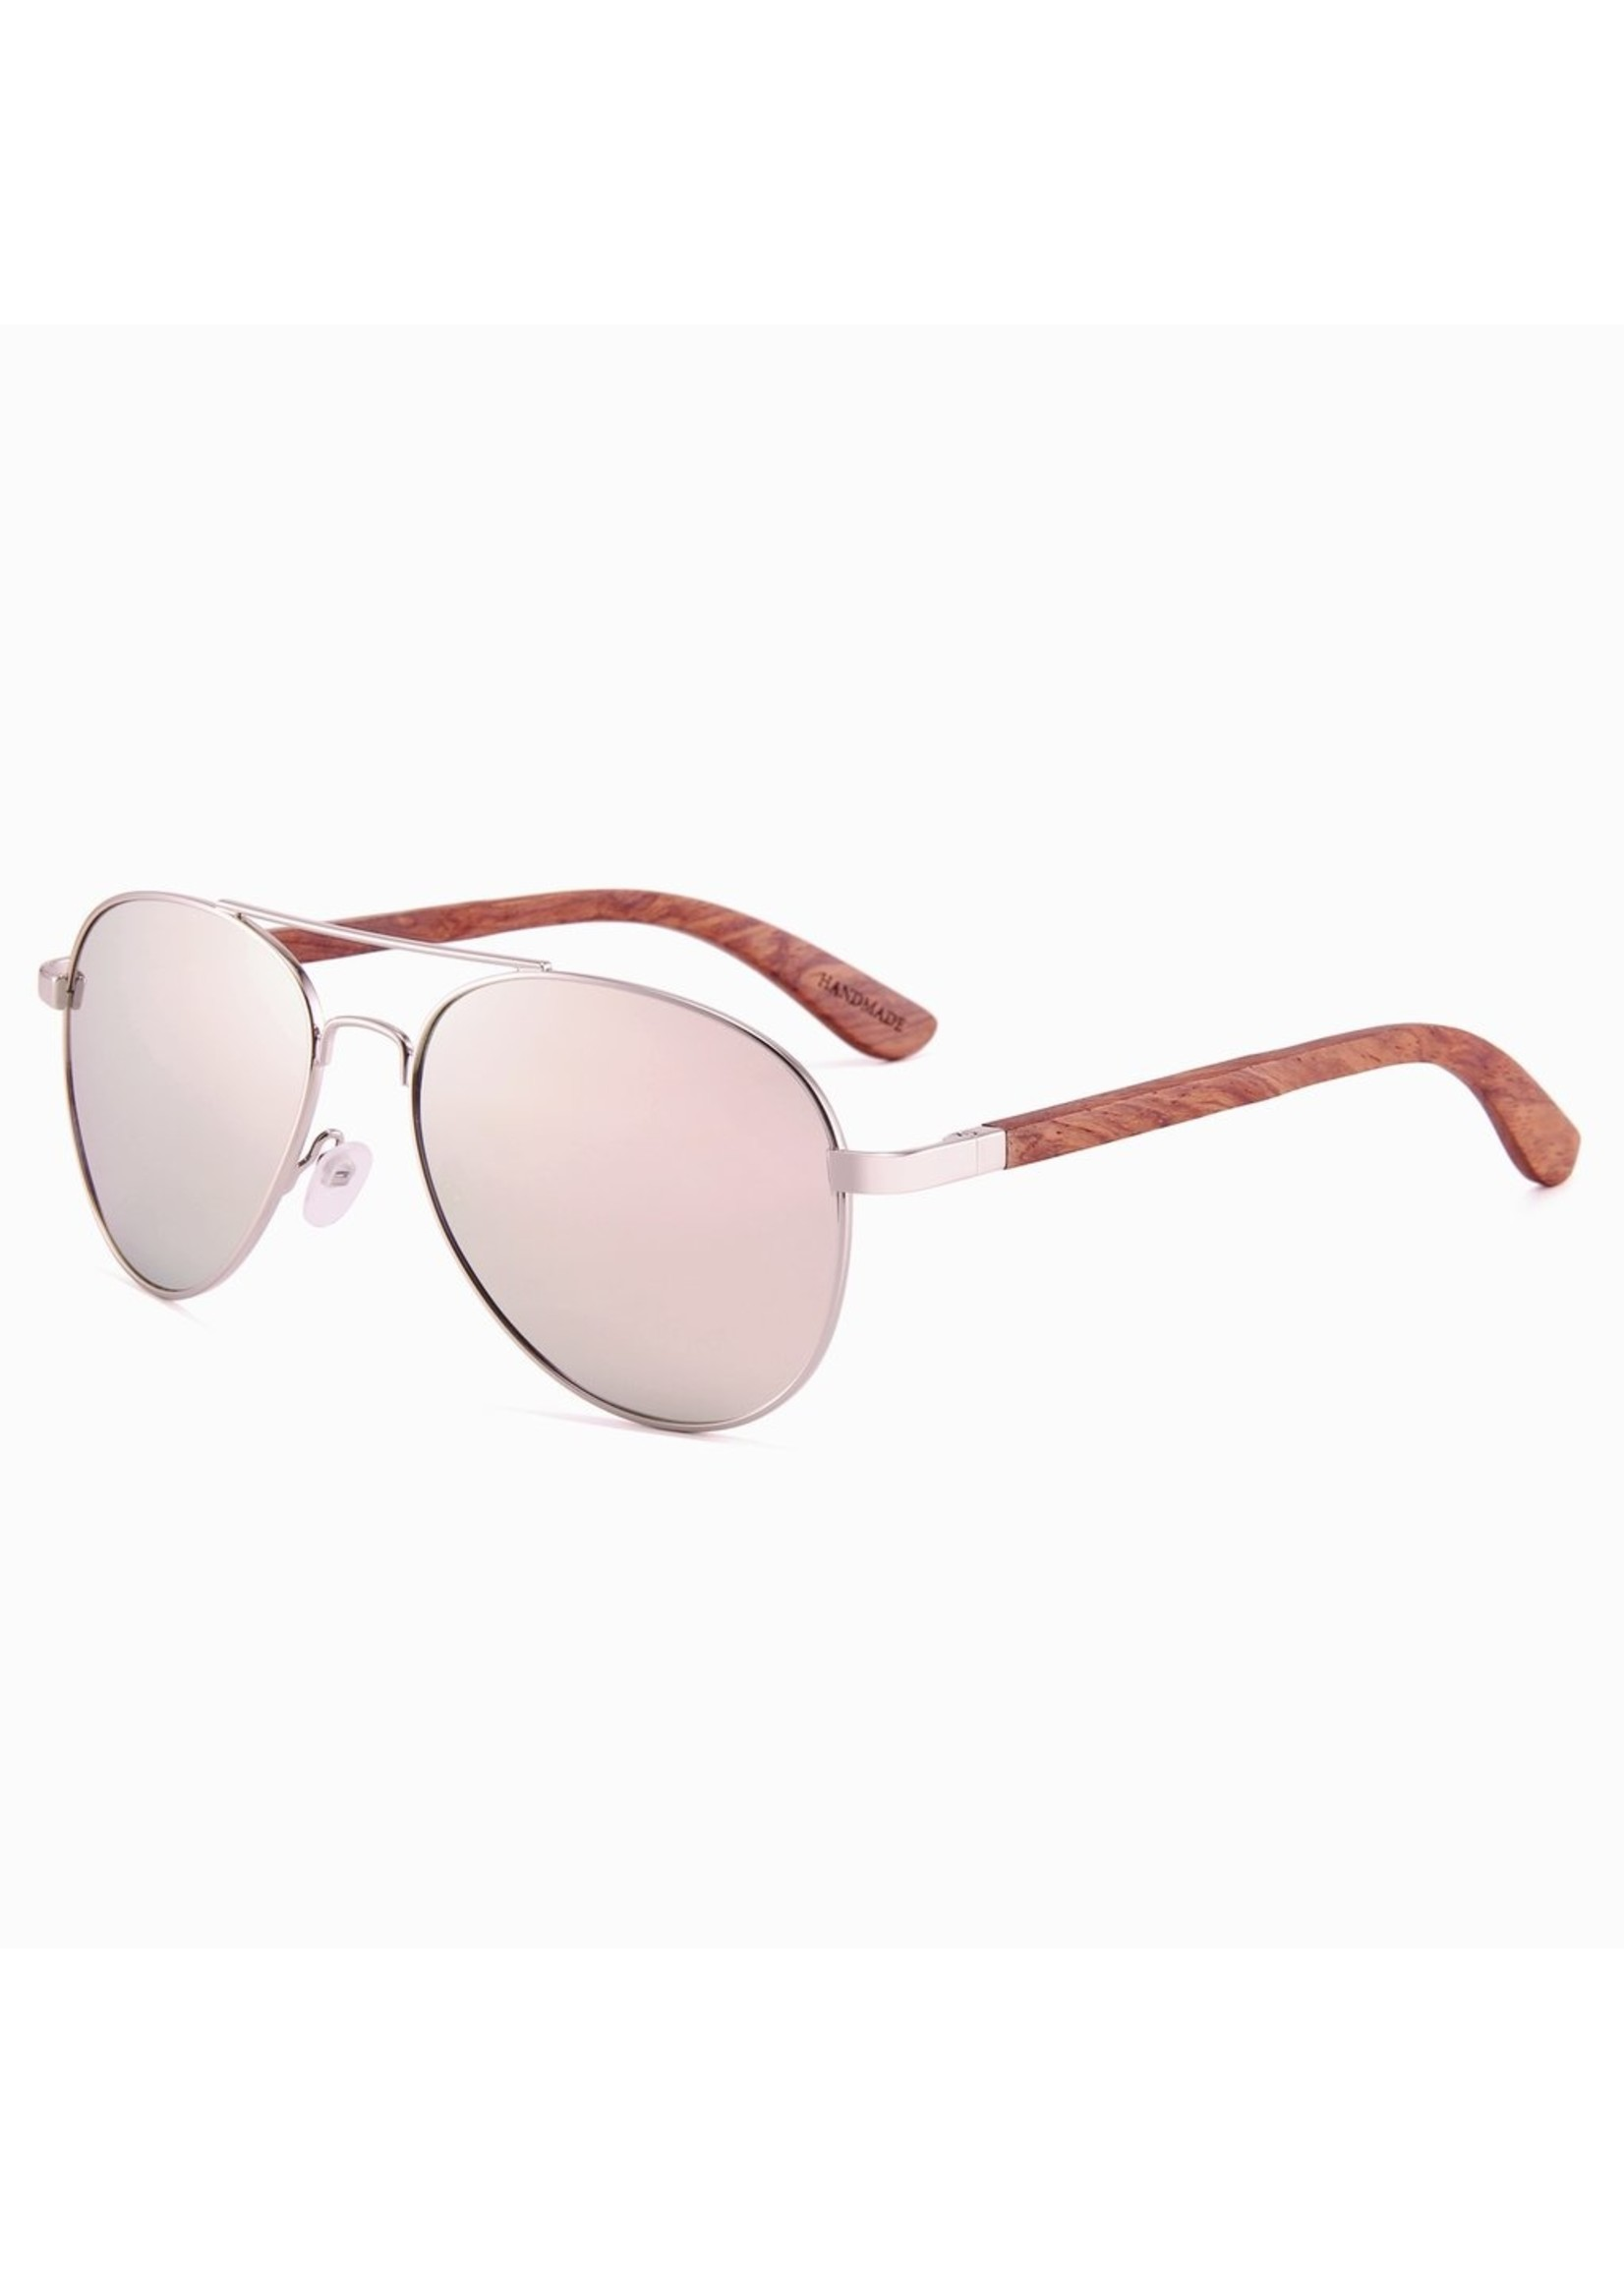 Kuma Sunglasses Hawaii - Mirrored Rose Gold